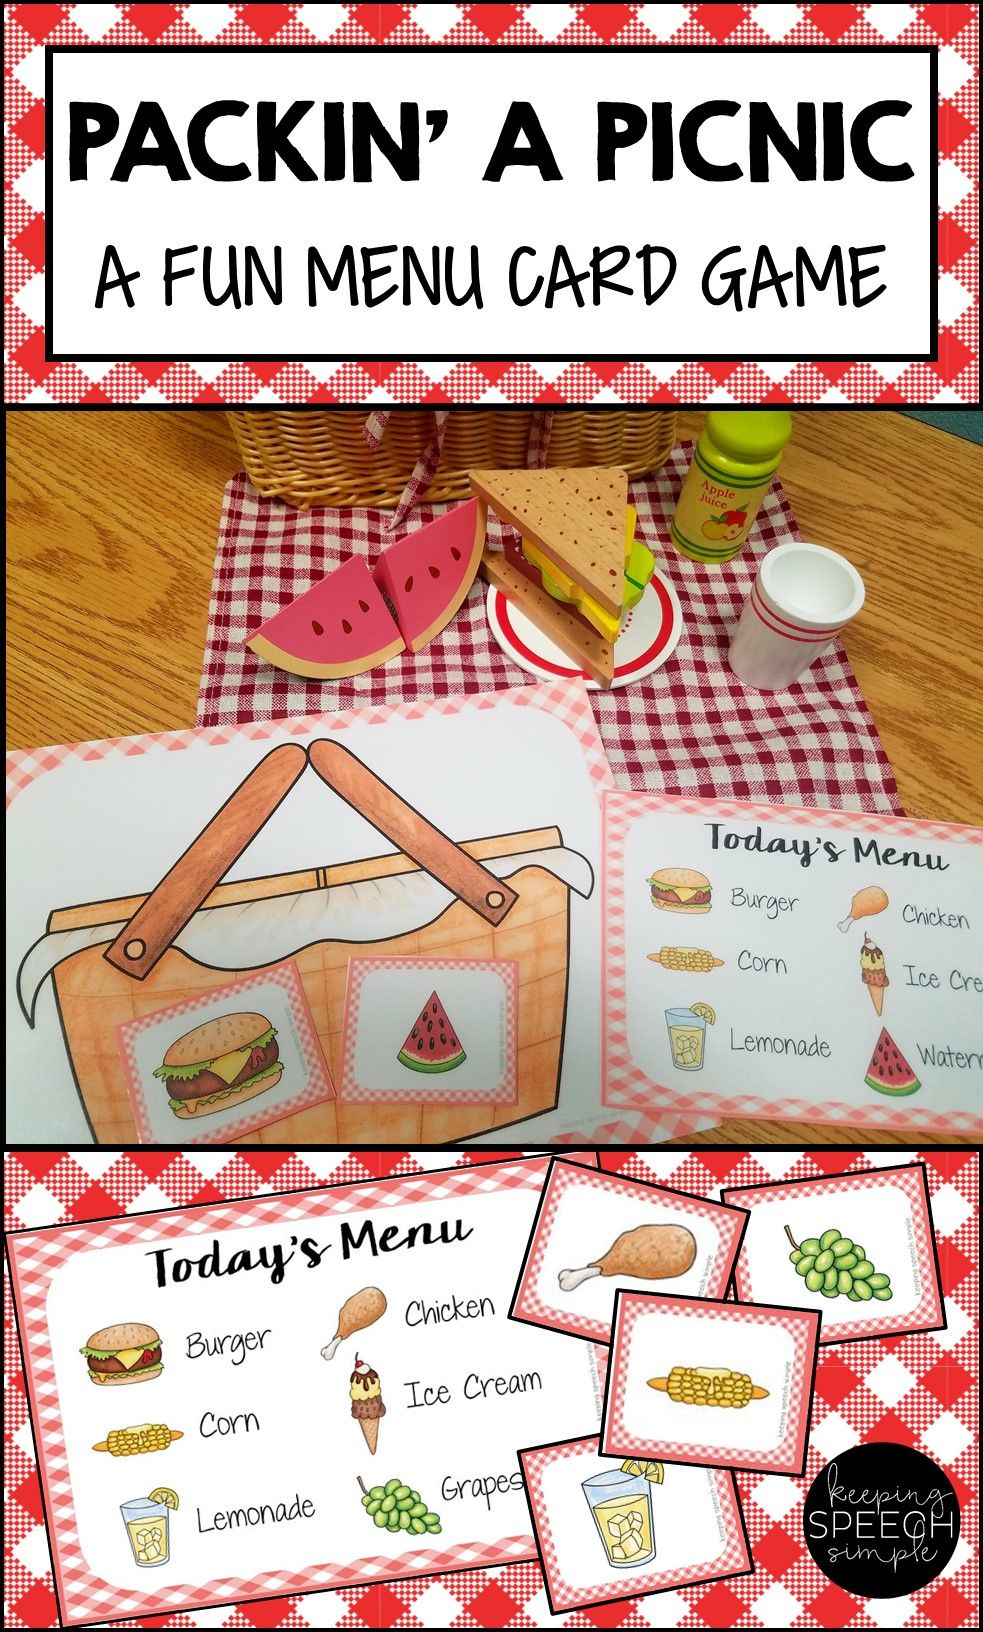 This Fun Picnic Themed Menu Card Game Is A Perfect Way For Preschoolers And Kindergarten Students To Dev Picnic Activities Preschool Activities Preschool Games [ 1632 x 983 Pixel ]